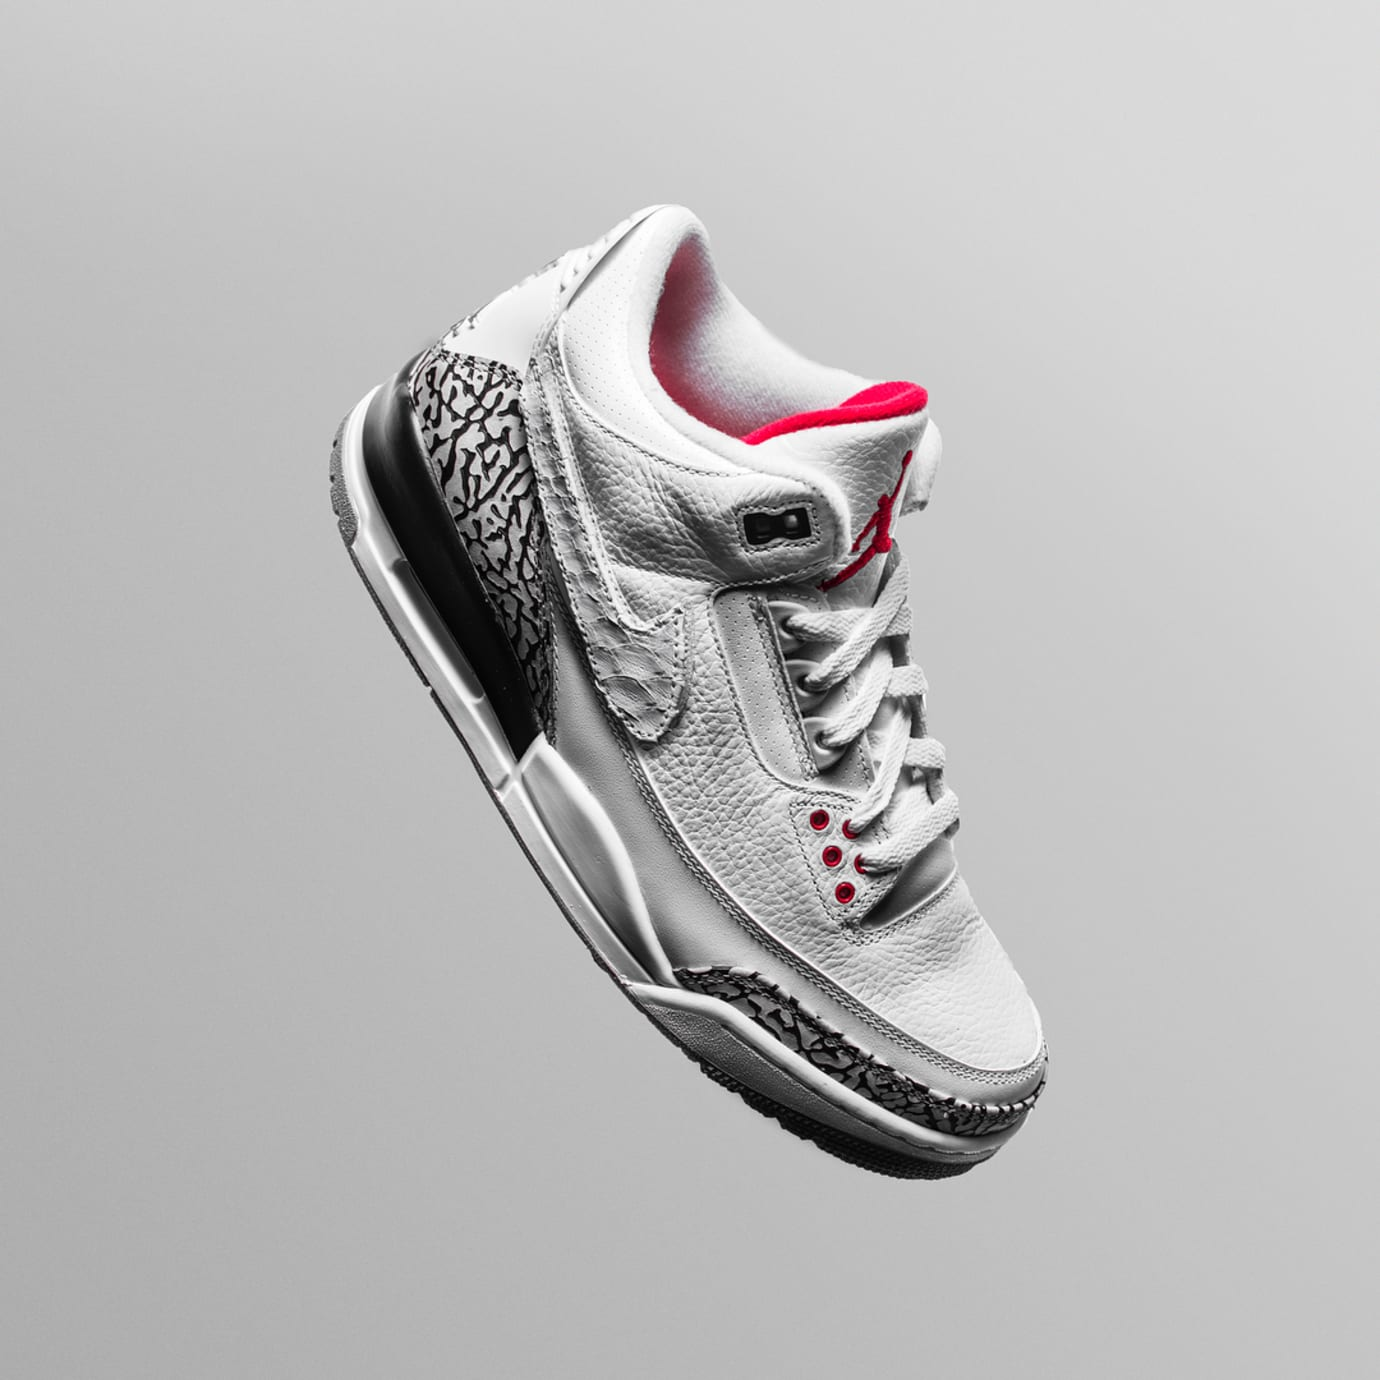 The Shoe Surgeon x Cement Air Jordan 3 Interchangeable Swoosh Custom White Python